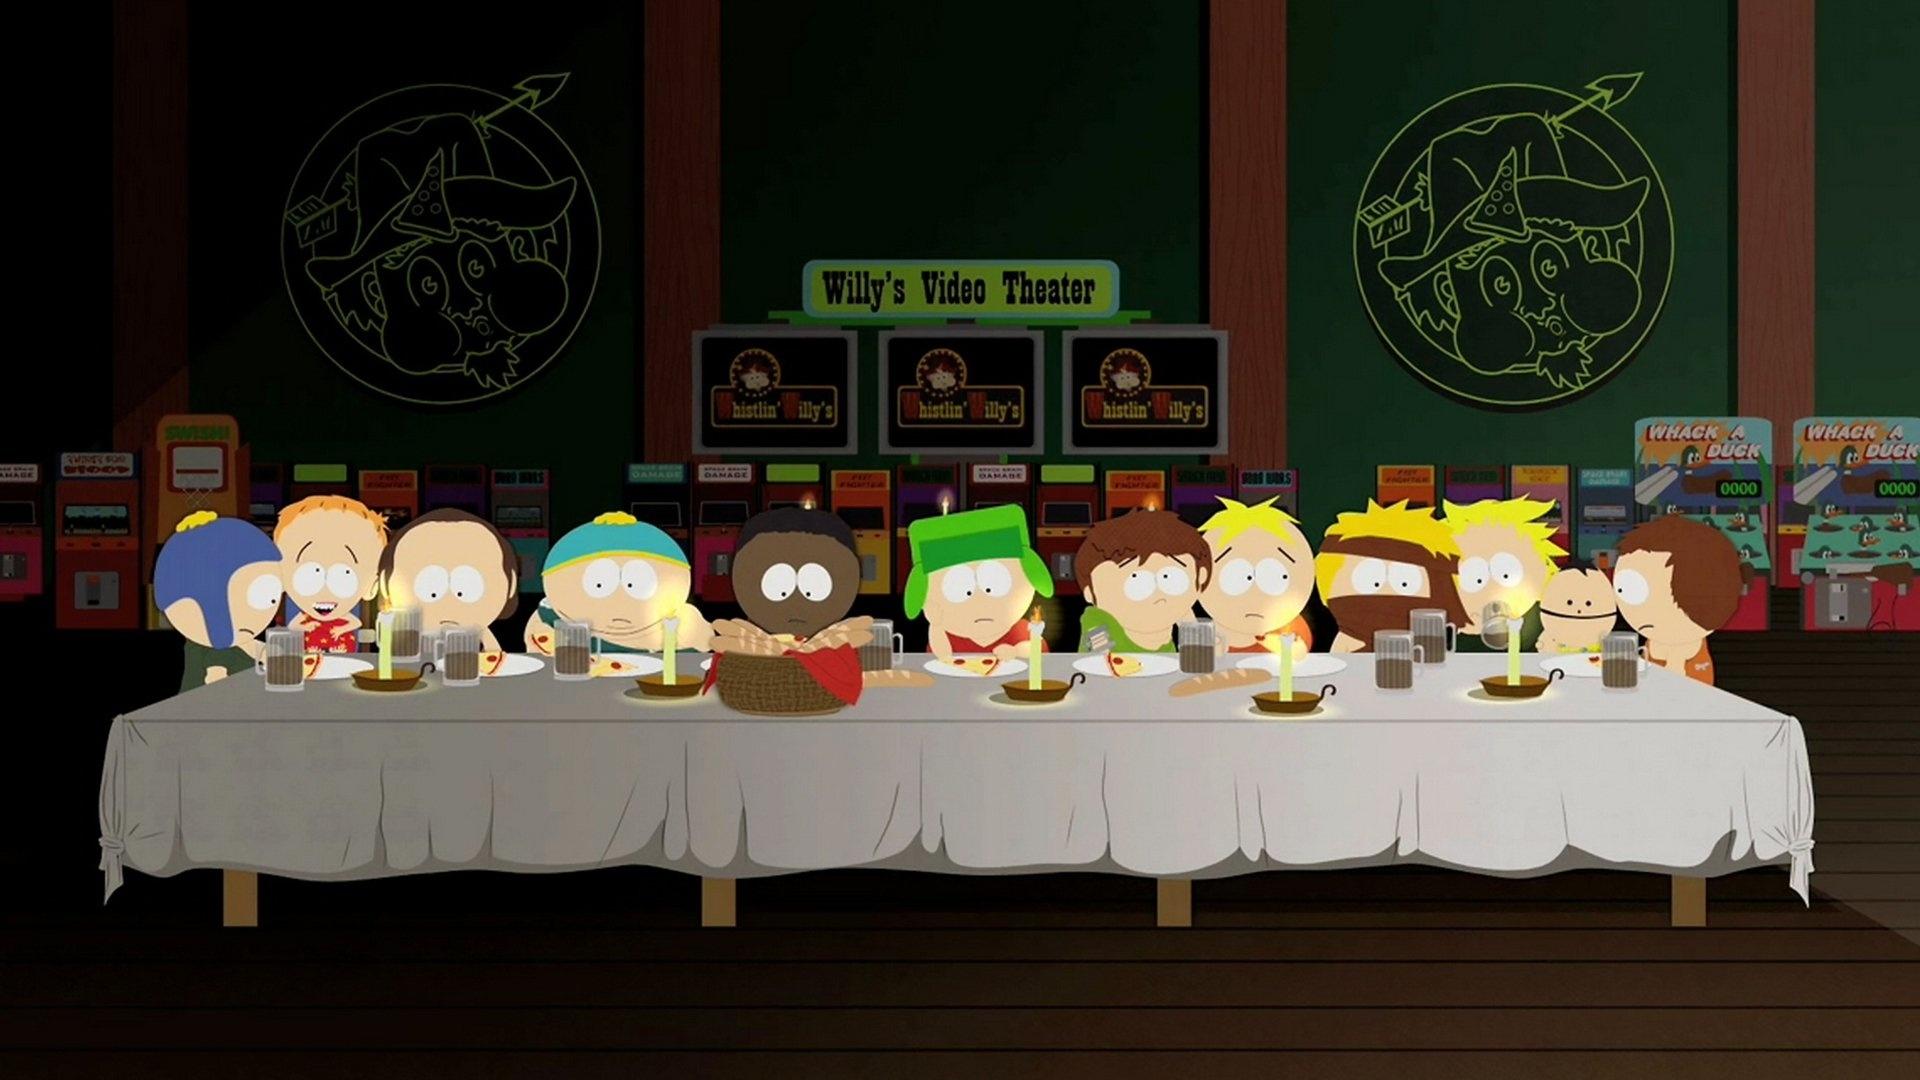 South Park windows wallpaper